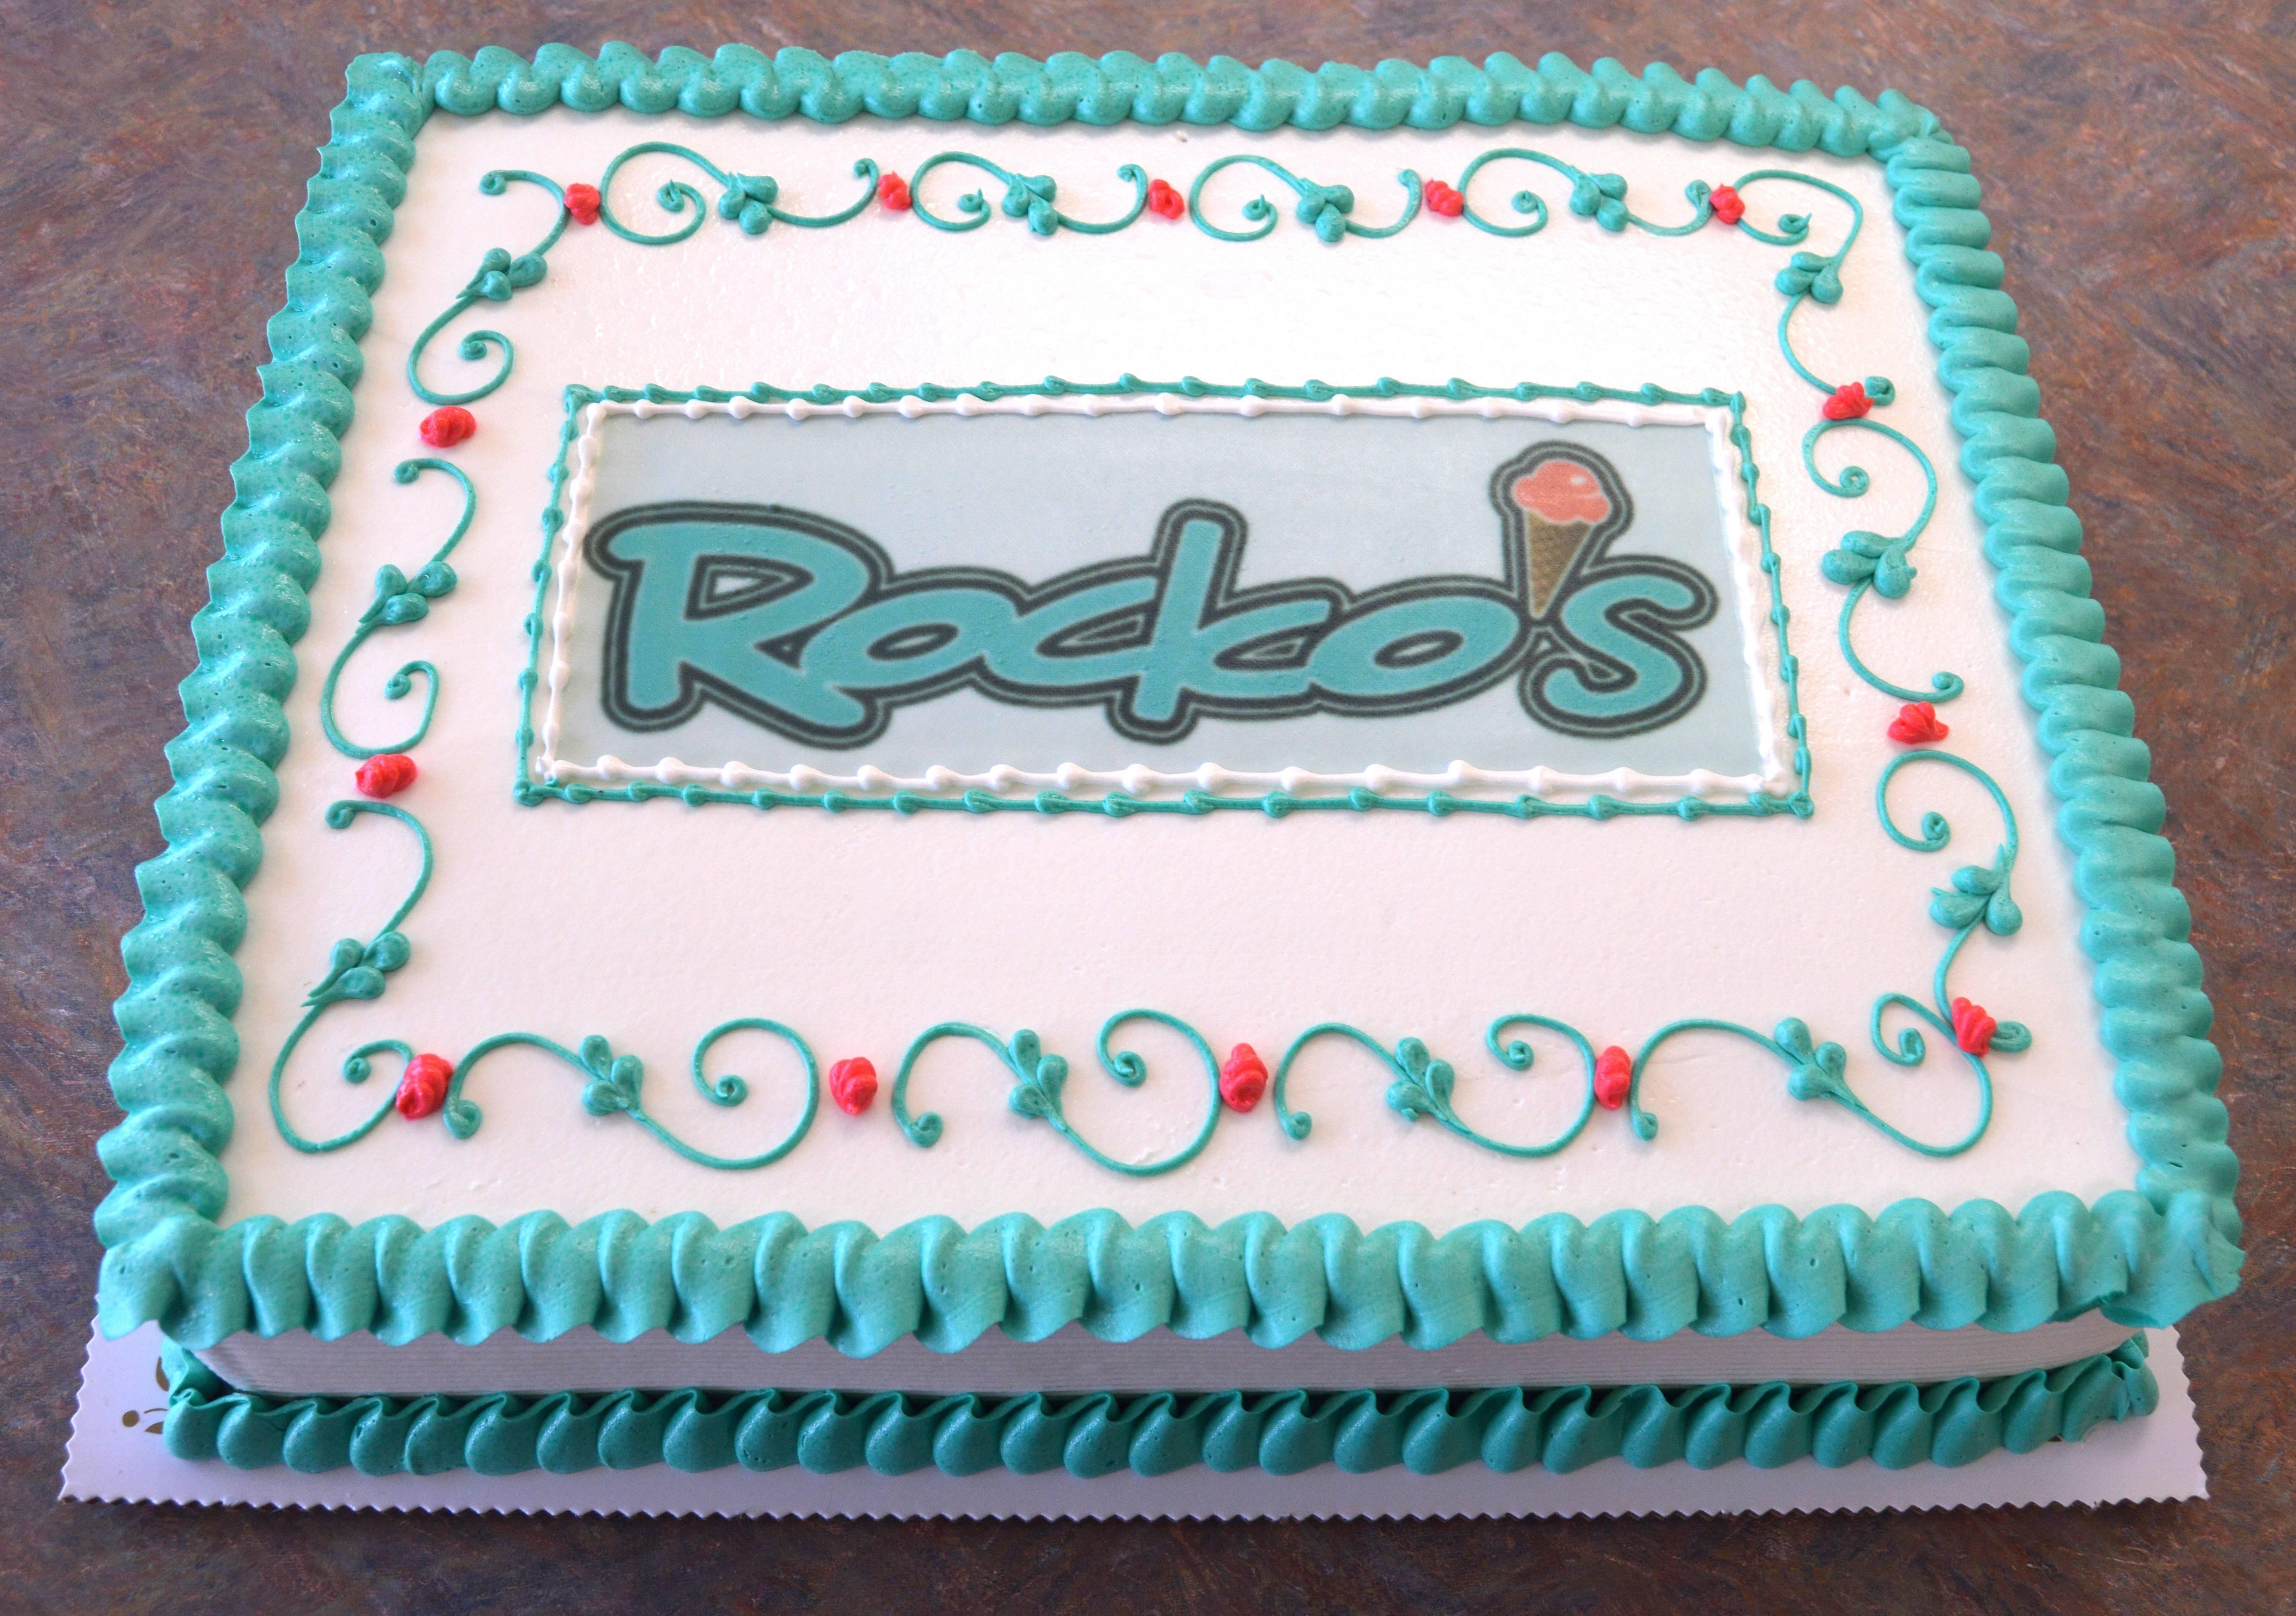 07d5394d8607c169b8b4_Birthday_cake.JPG